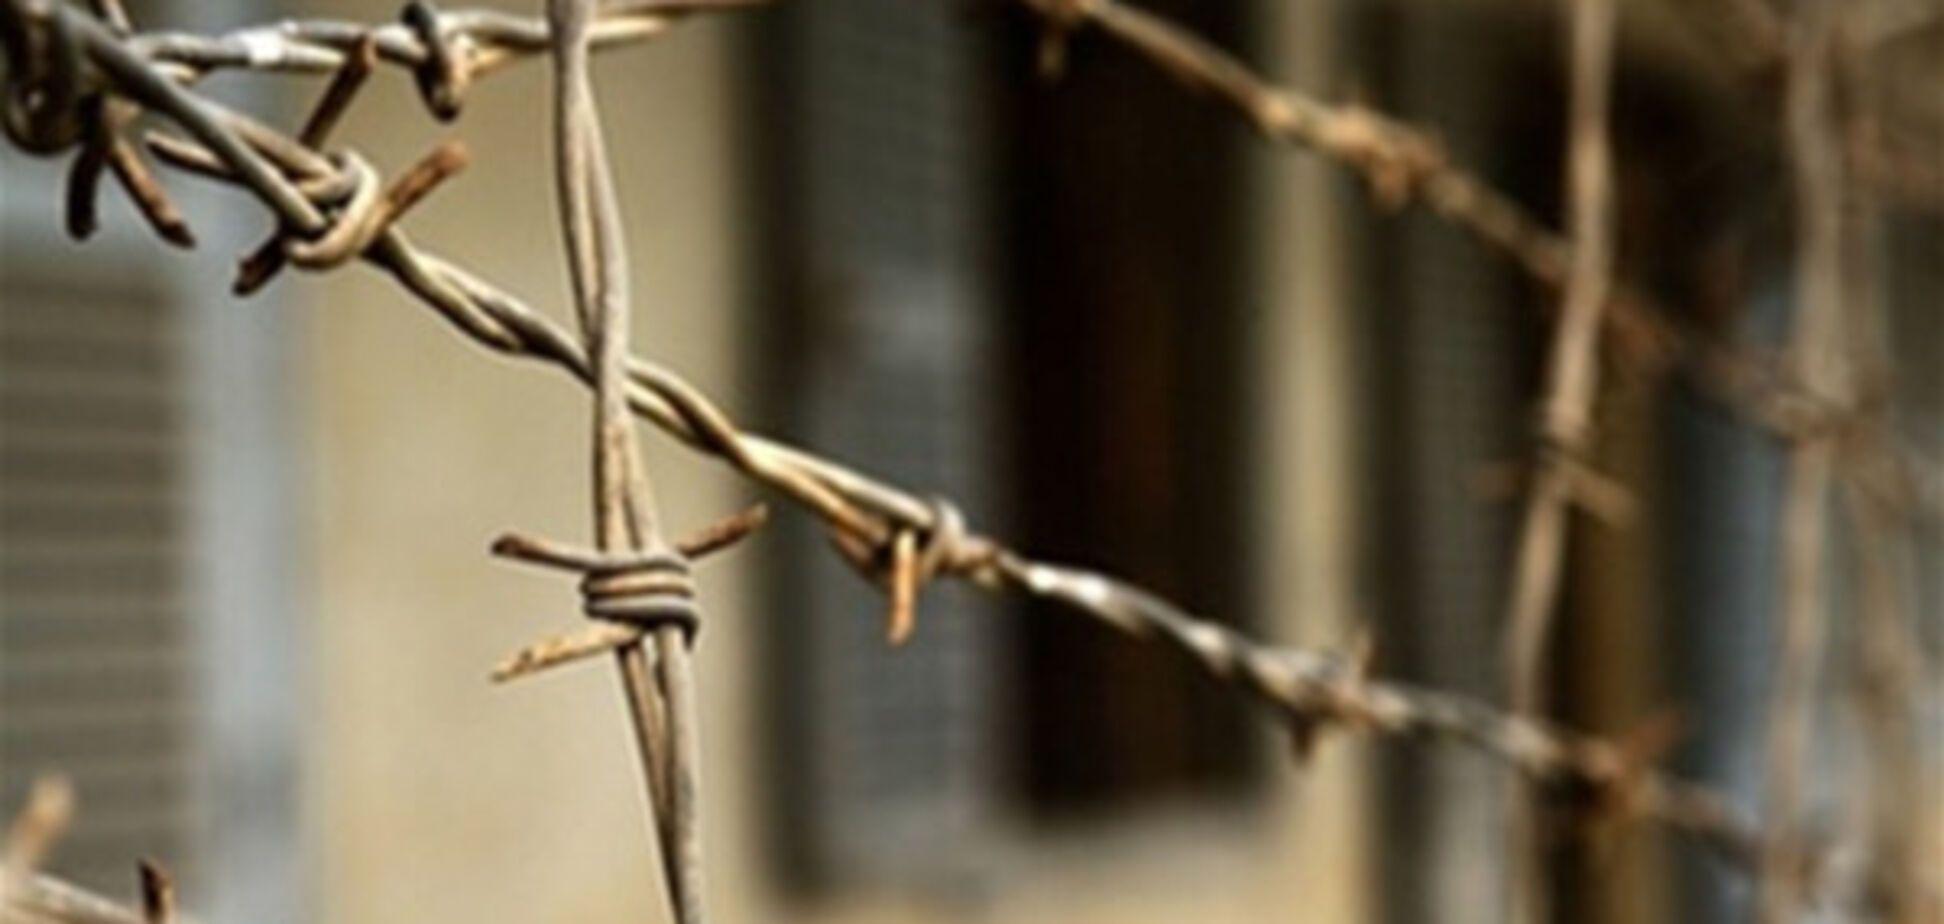 Работник Запорожского СИЗО продавал наркотики заключенному